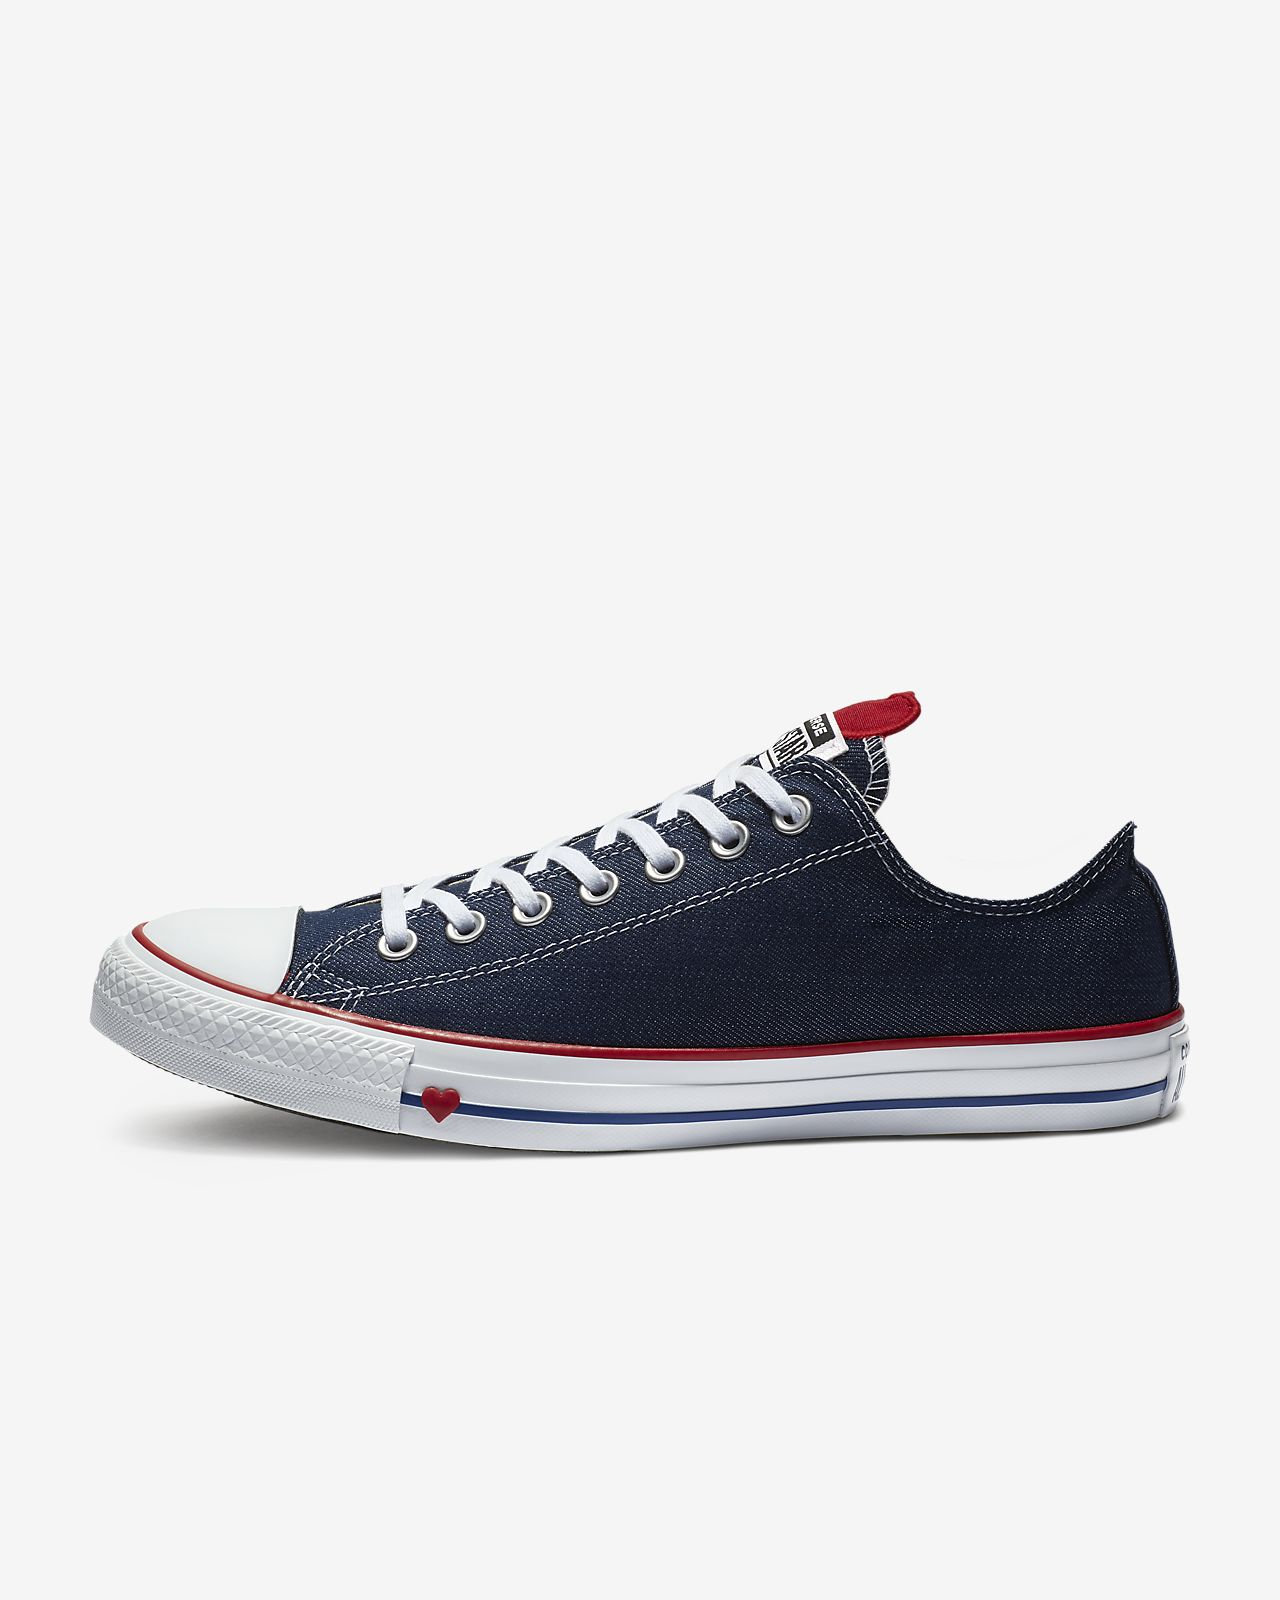 Chuck Taylor All Star Denim Love Low Top Unisex Shoe